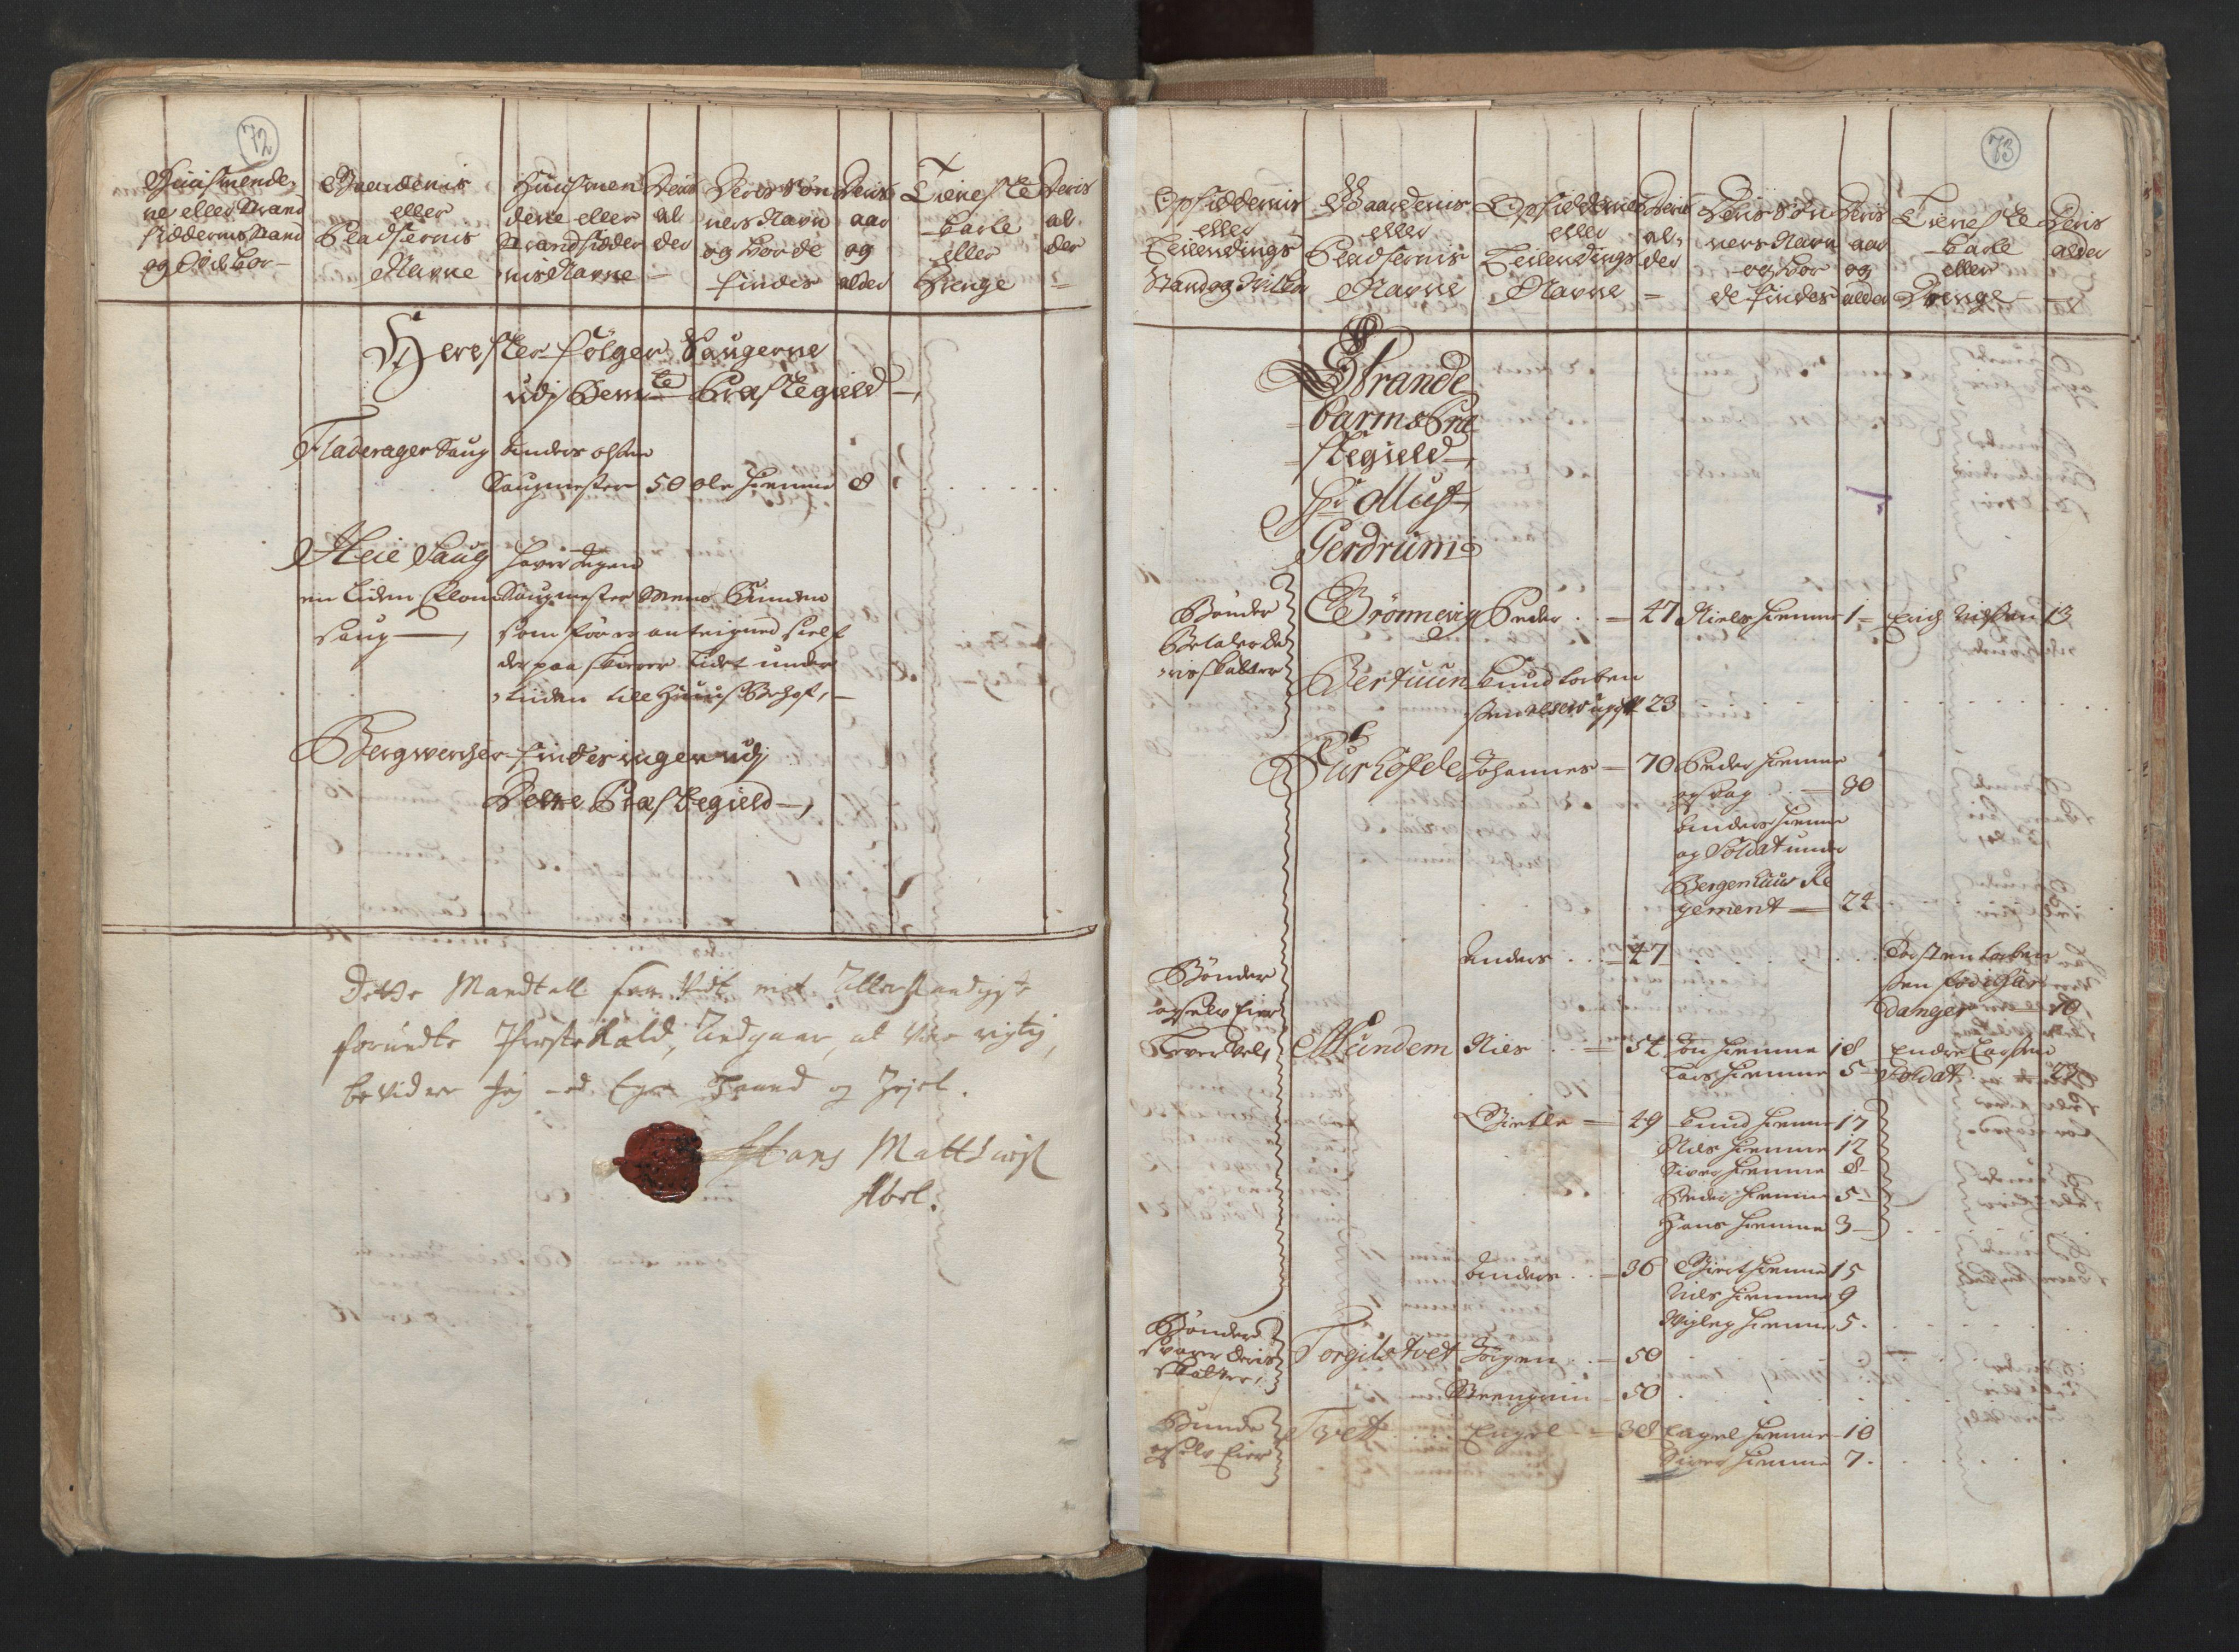 RA, Manntallet 1701, nr. 6: Sunnhordland fogderi og Hardanger fogderi, 1701, s. 72-73